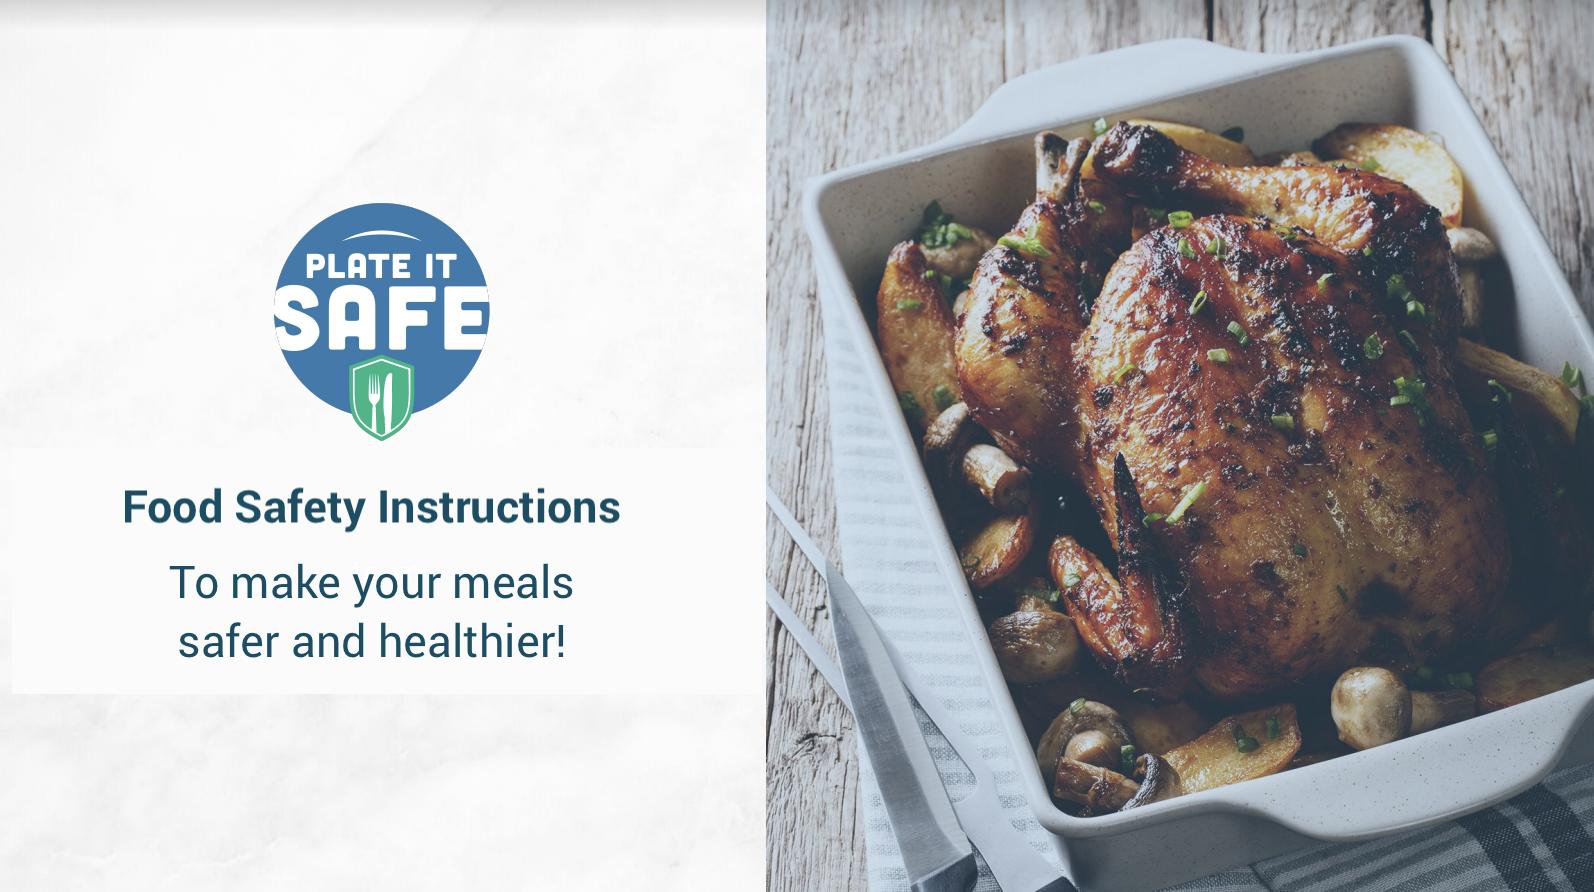 food safety - plate it safe image